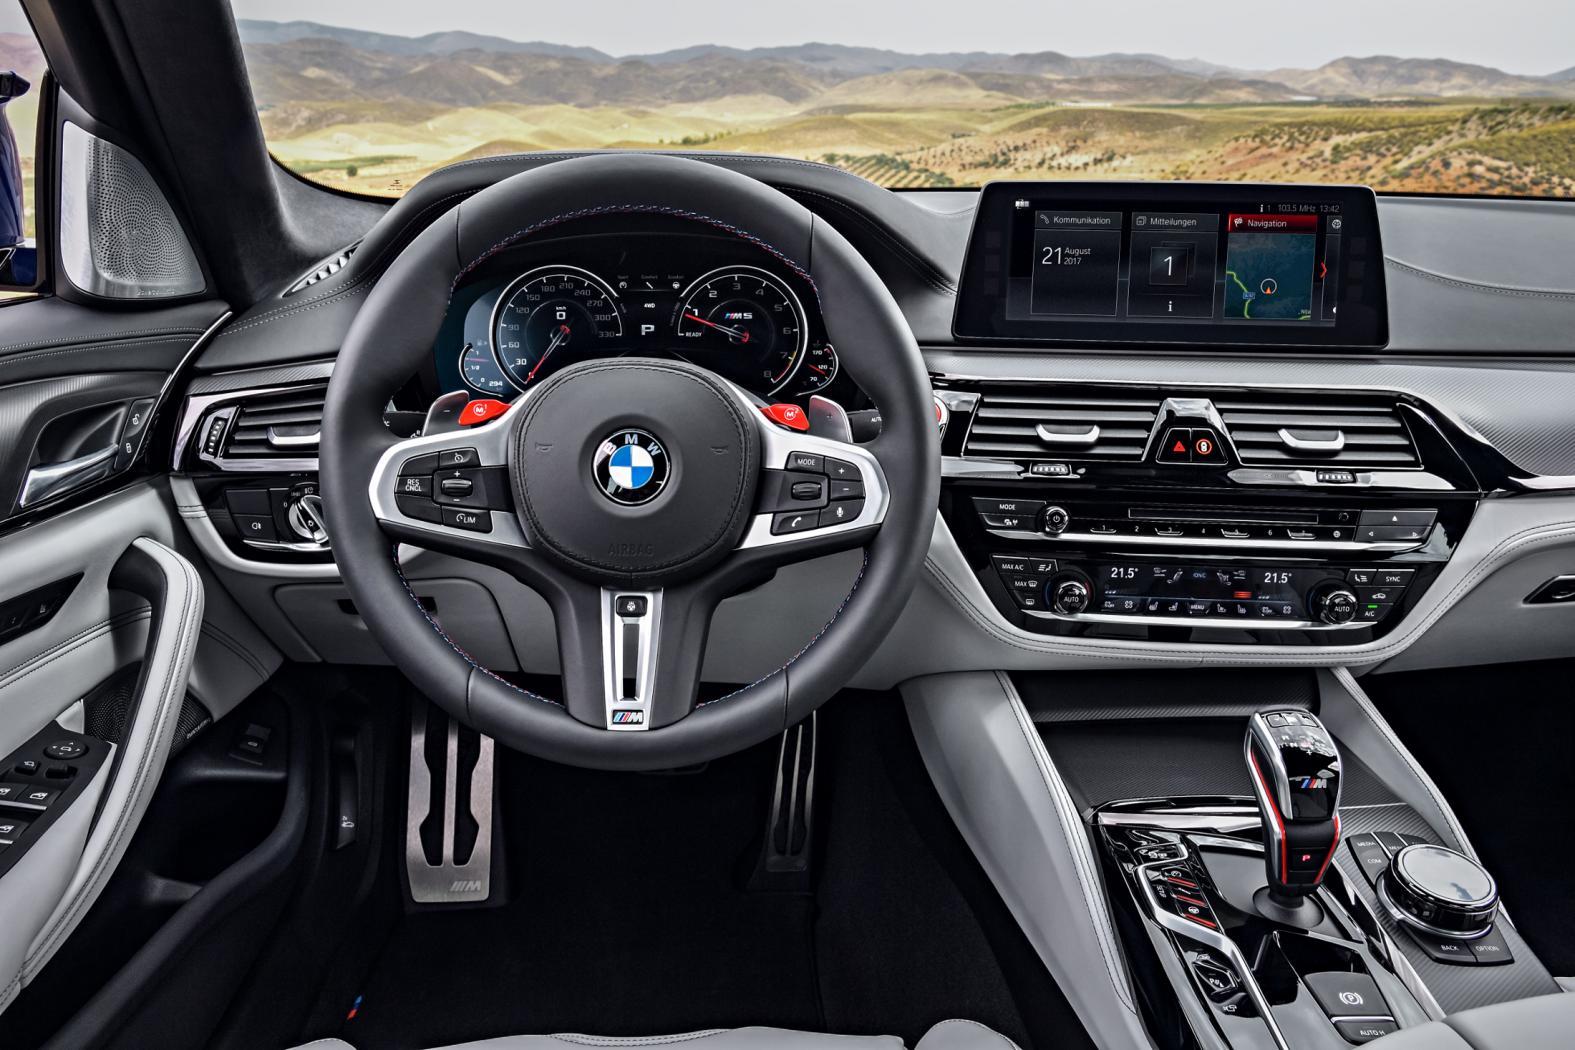 BMW-M5-F90-8.jpeg